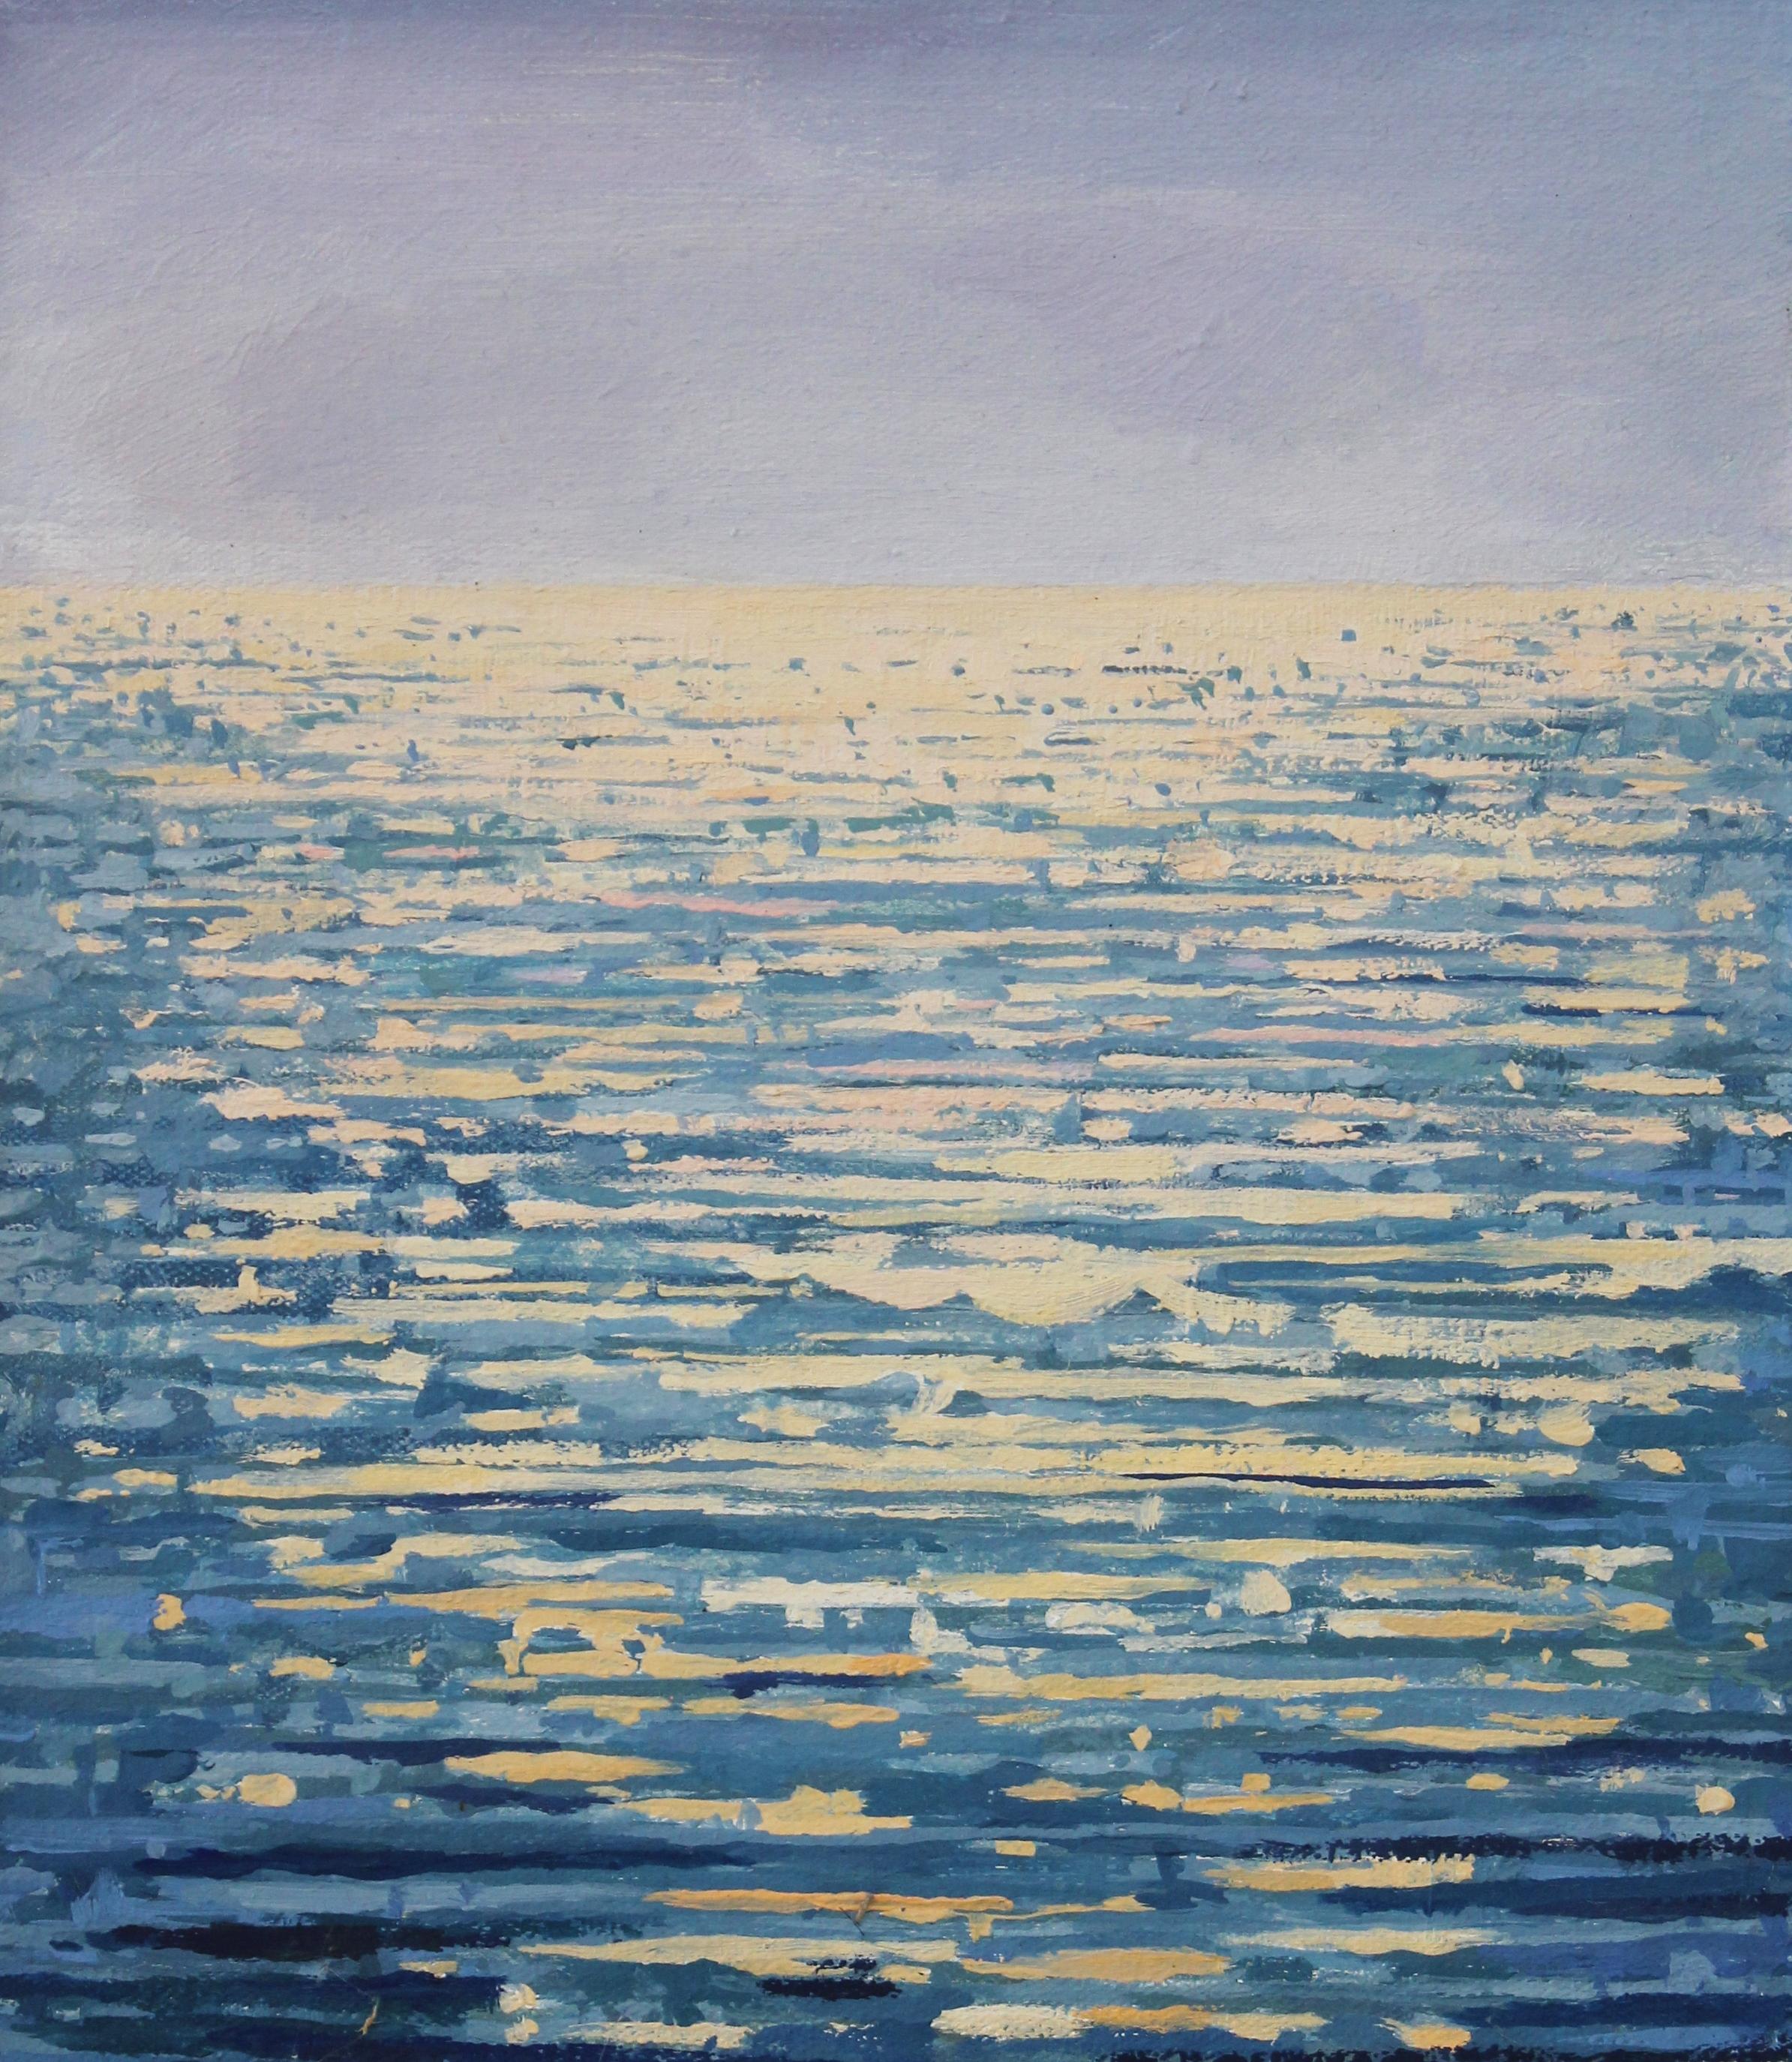 Ocean glimmer